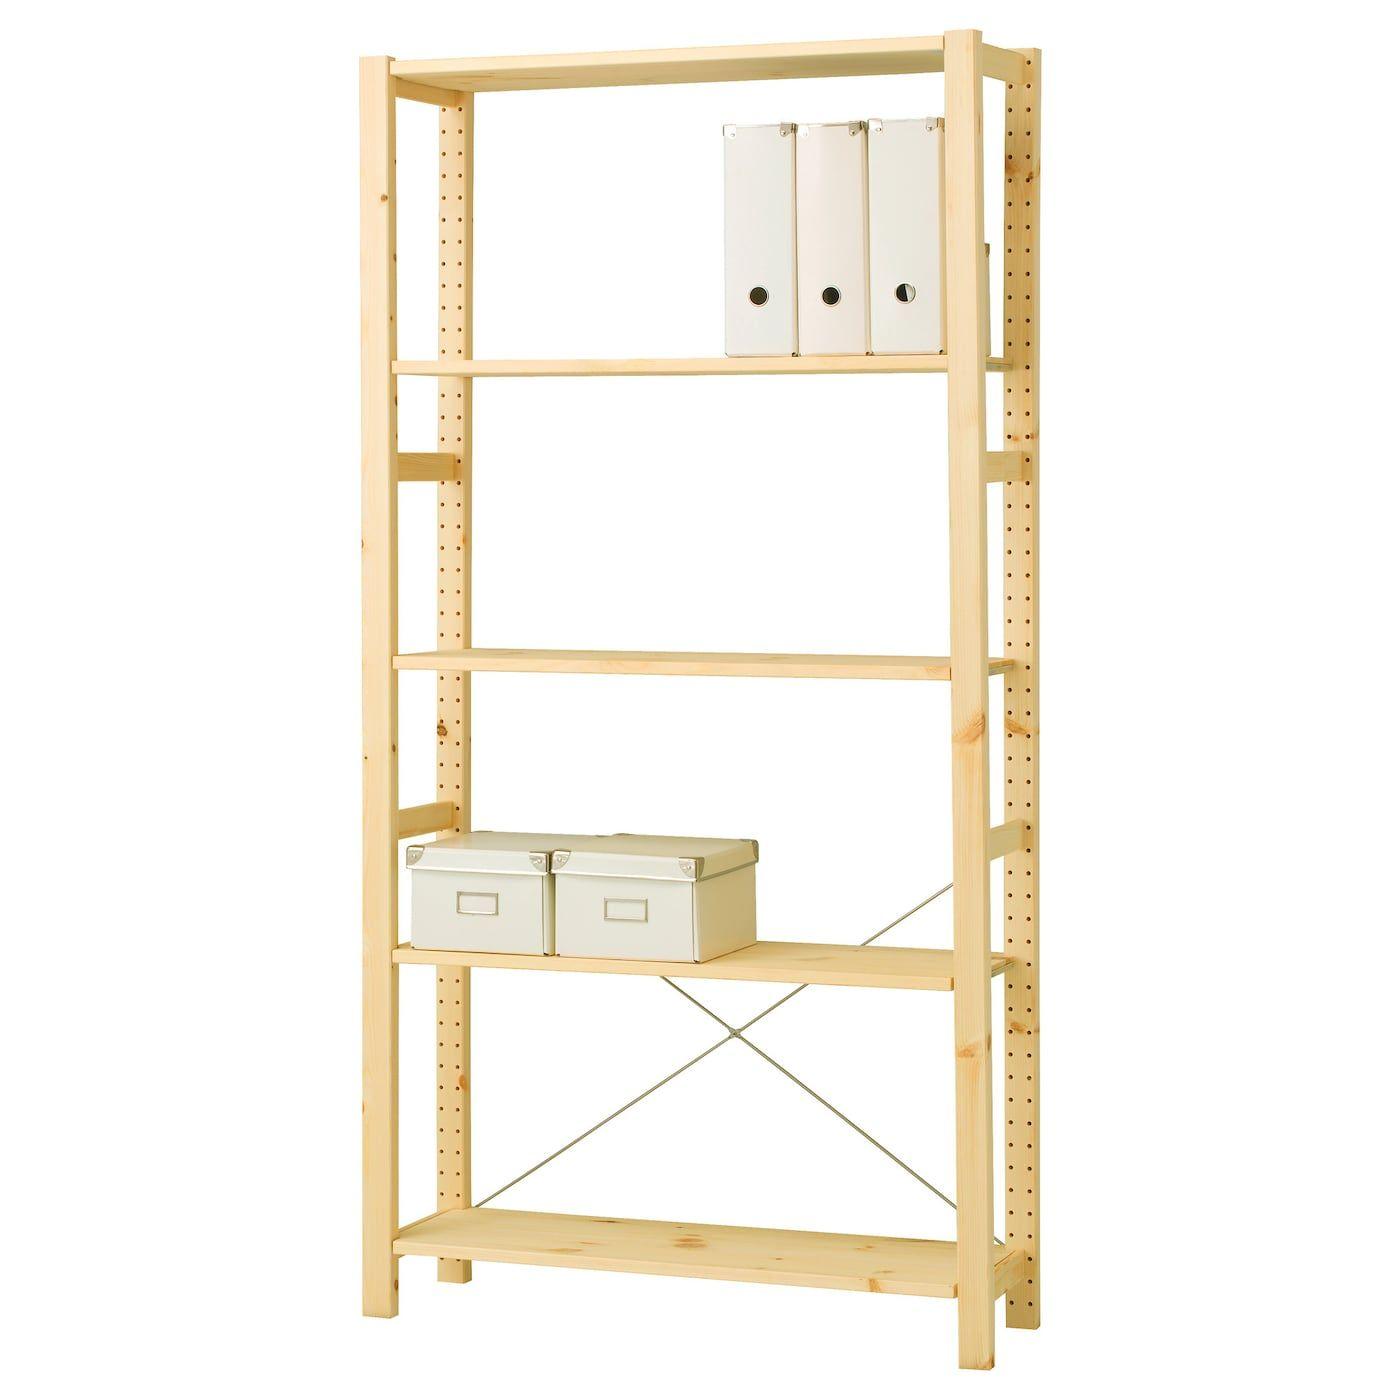 Ikea Scaffali Legno Ivar ivar scaffale - pino 89x30x179 cm | etagere en pin, idées